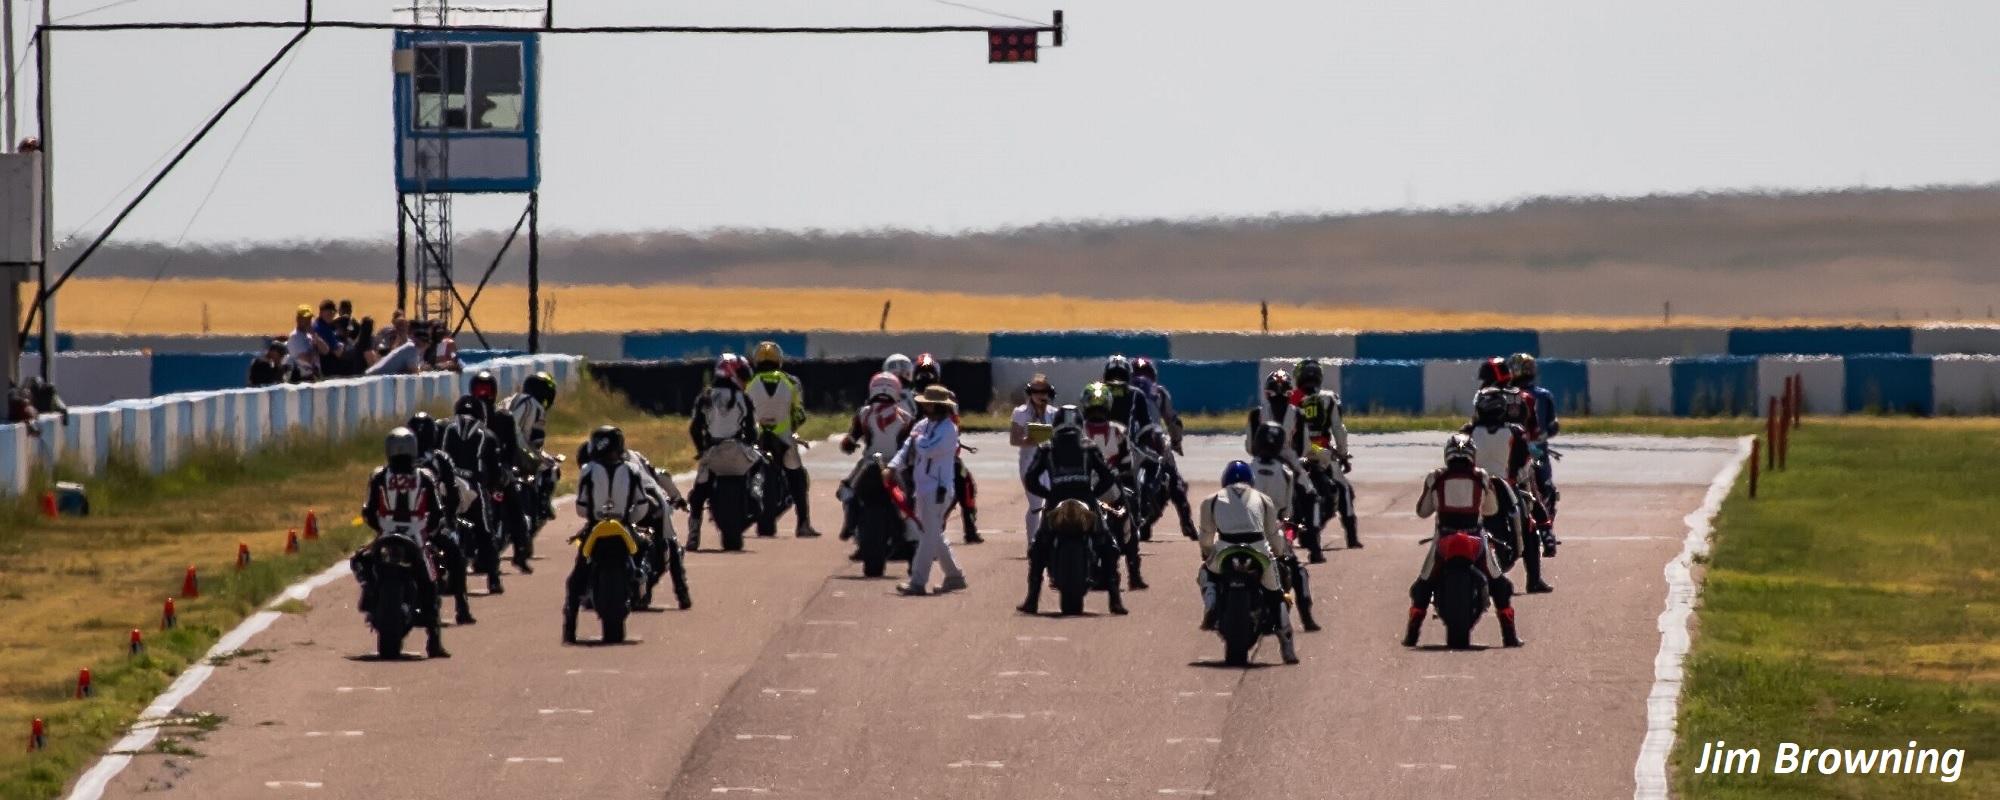 Drive Safe Colorado >> High Plains Raceway - Colorado's Top Amateur Racing Track and Facility